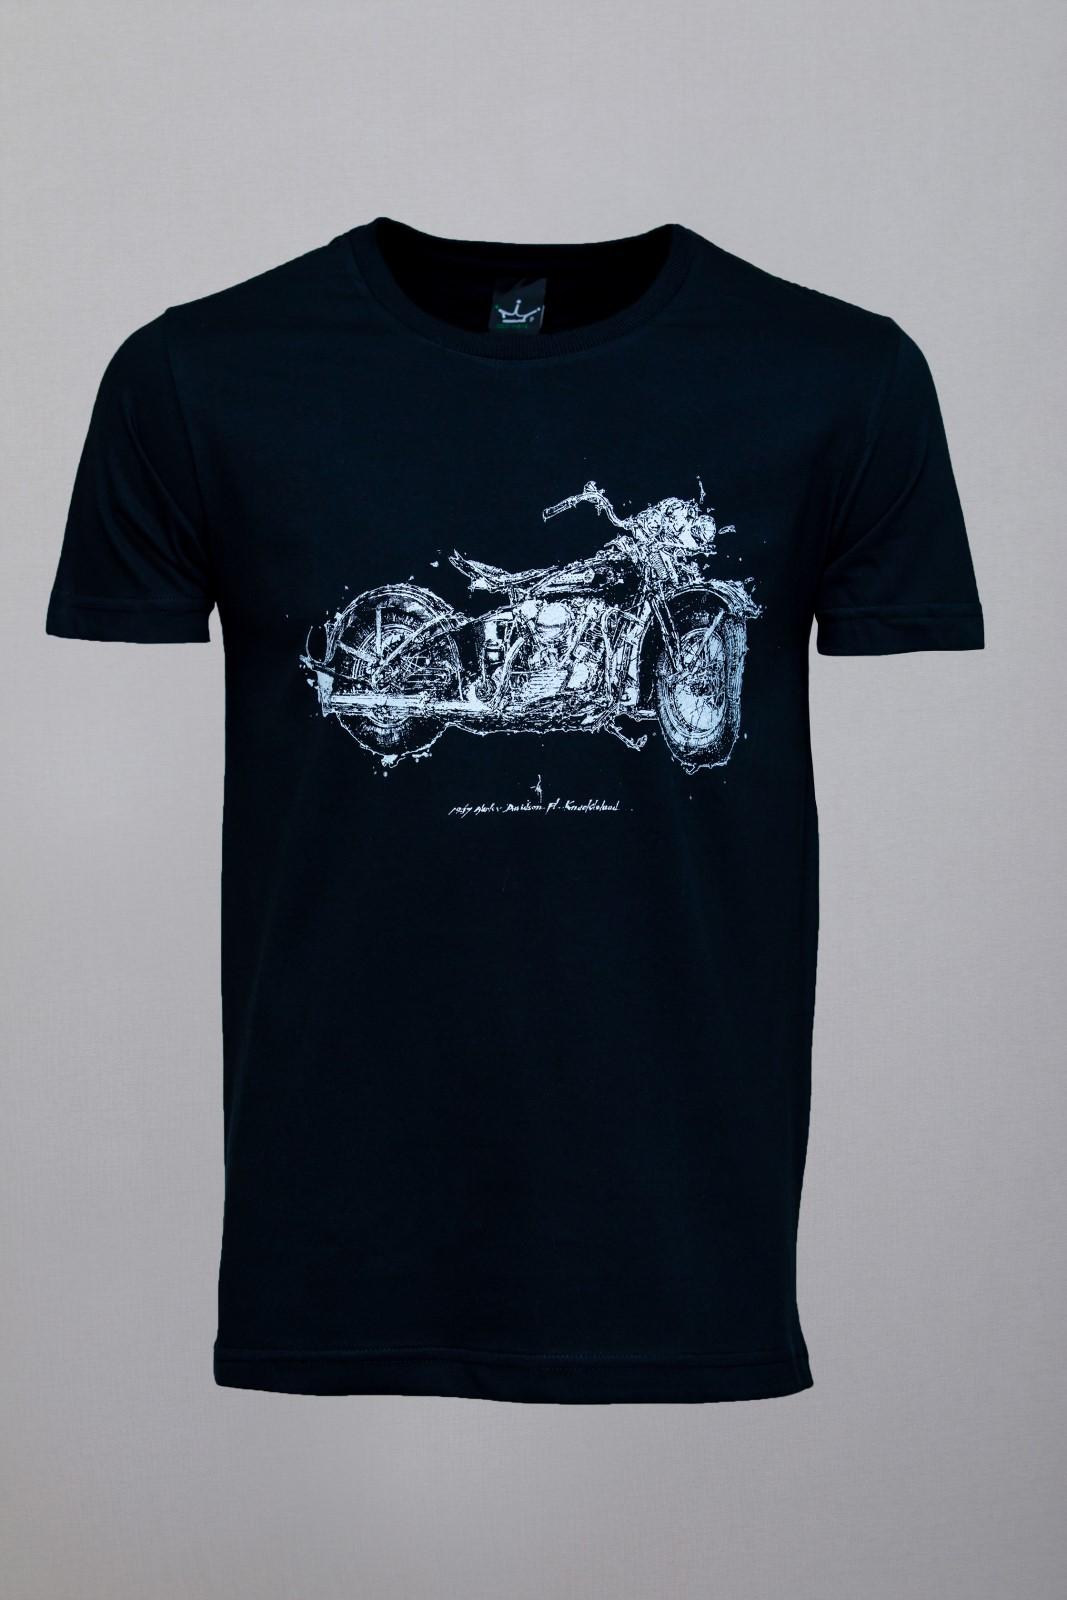 Camiseta CoolWave Motorcycle Soul